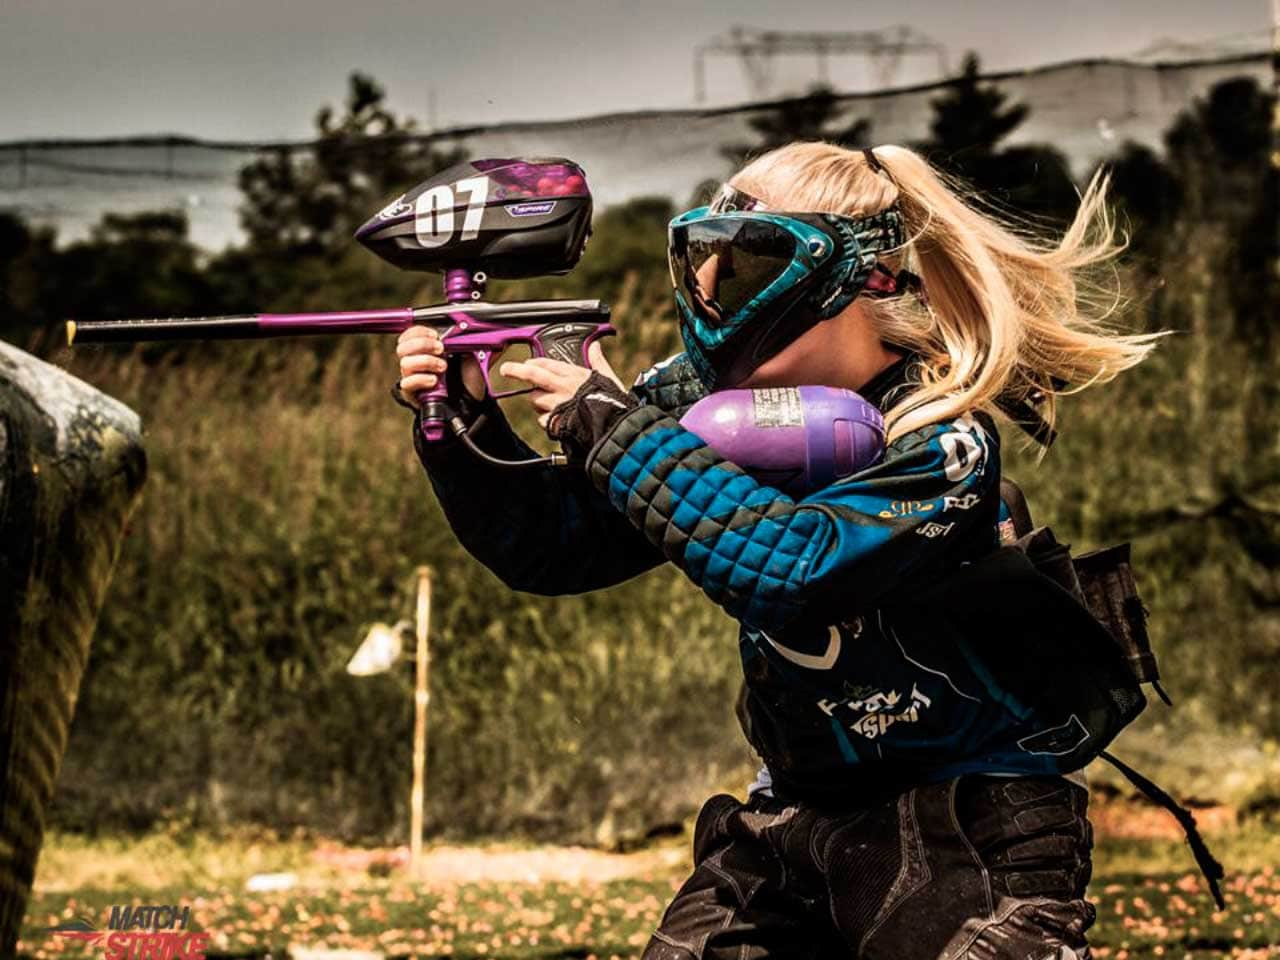 Mega Arena – 100% Action, Fun & Adrenalin